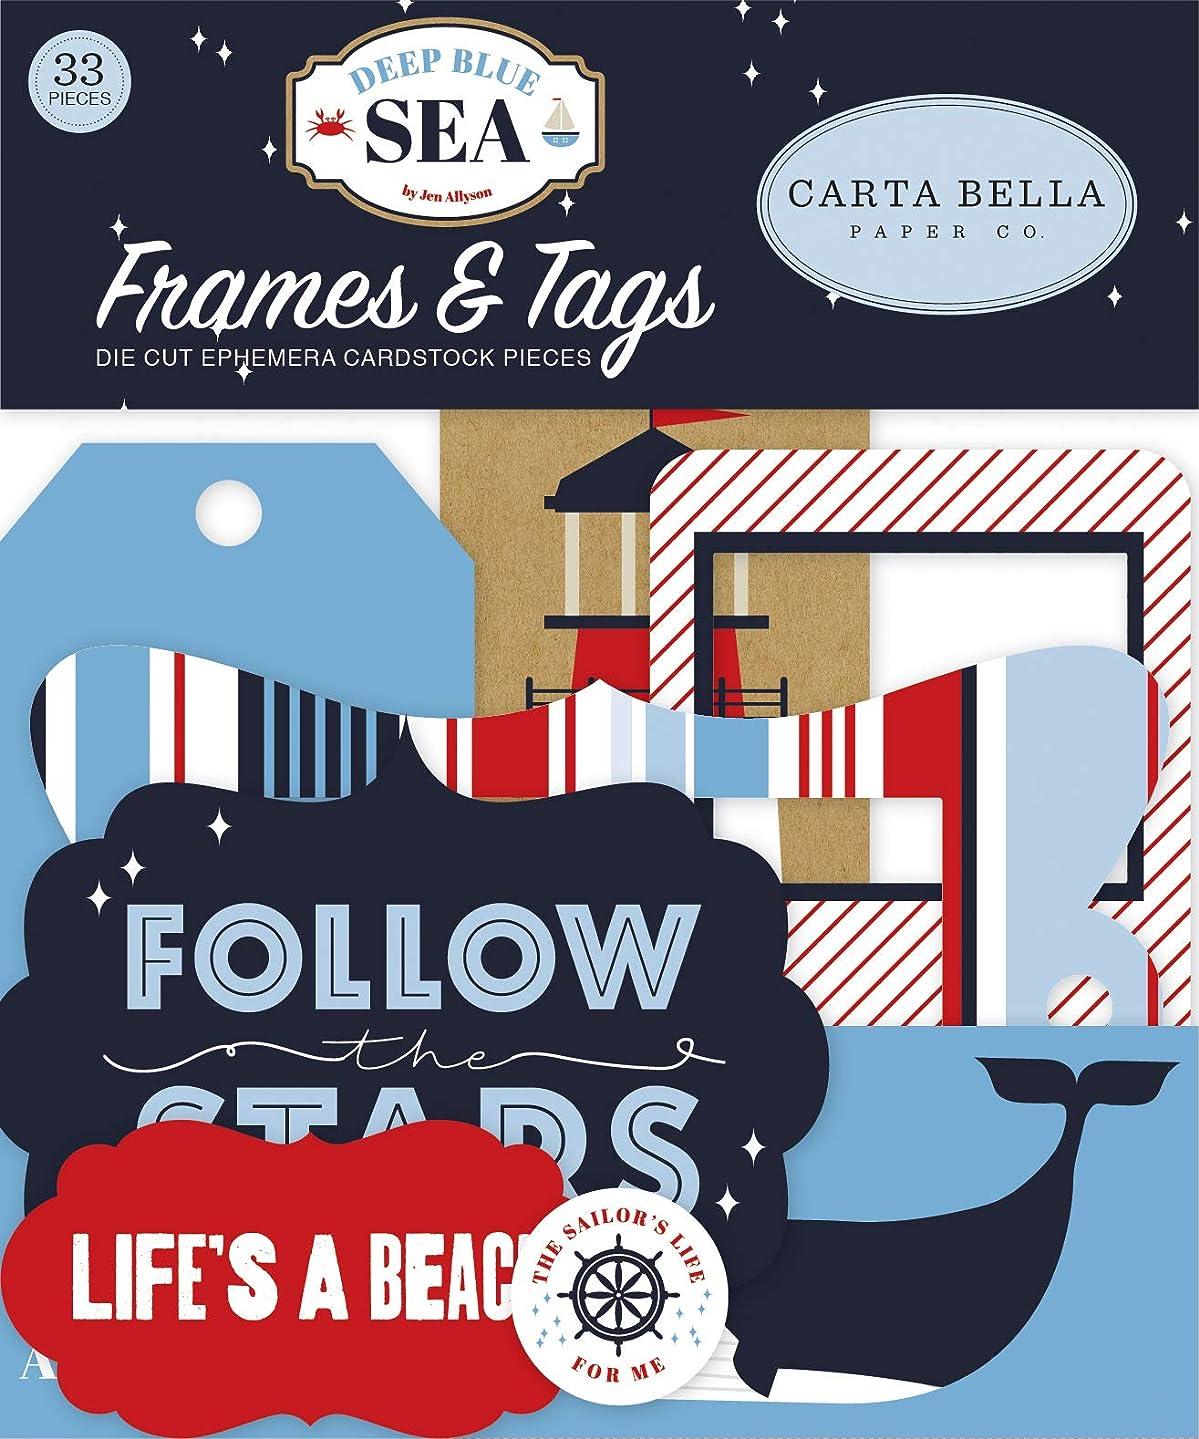 Carta Bella Paper Company CBDB102025 Deep Blue Sea Frames & Tags Ephemera, red, Navy, White